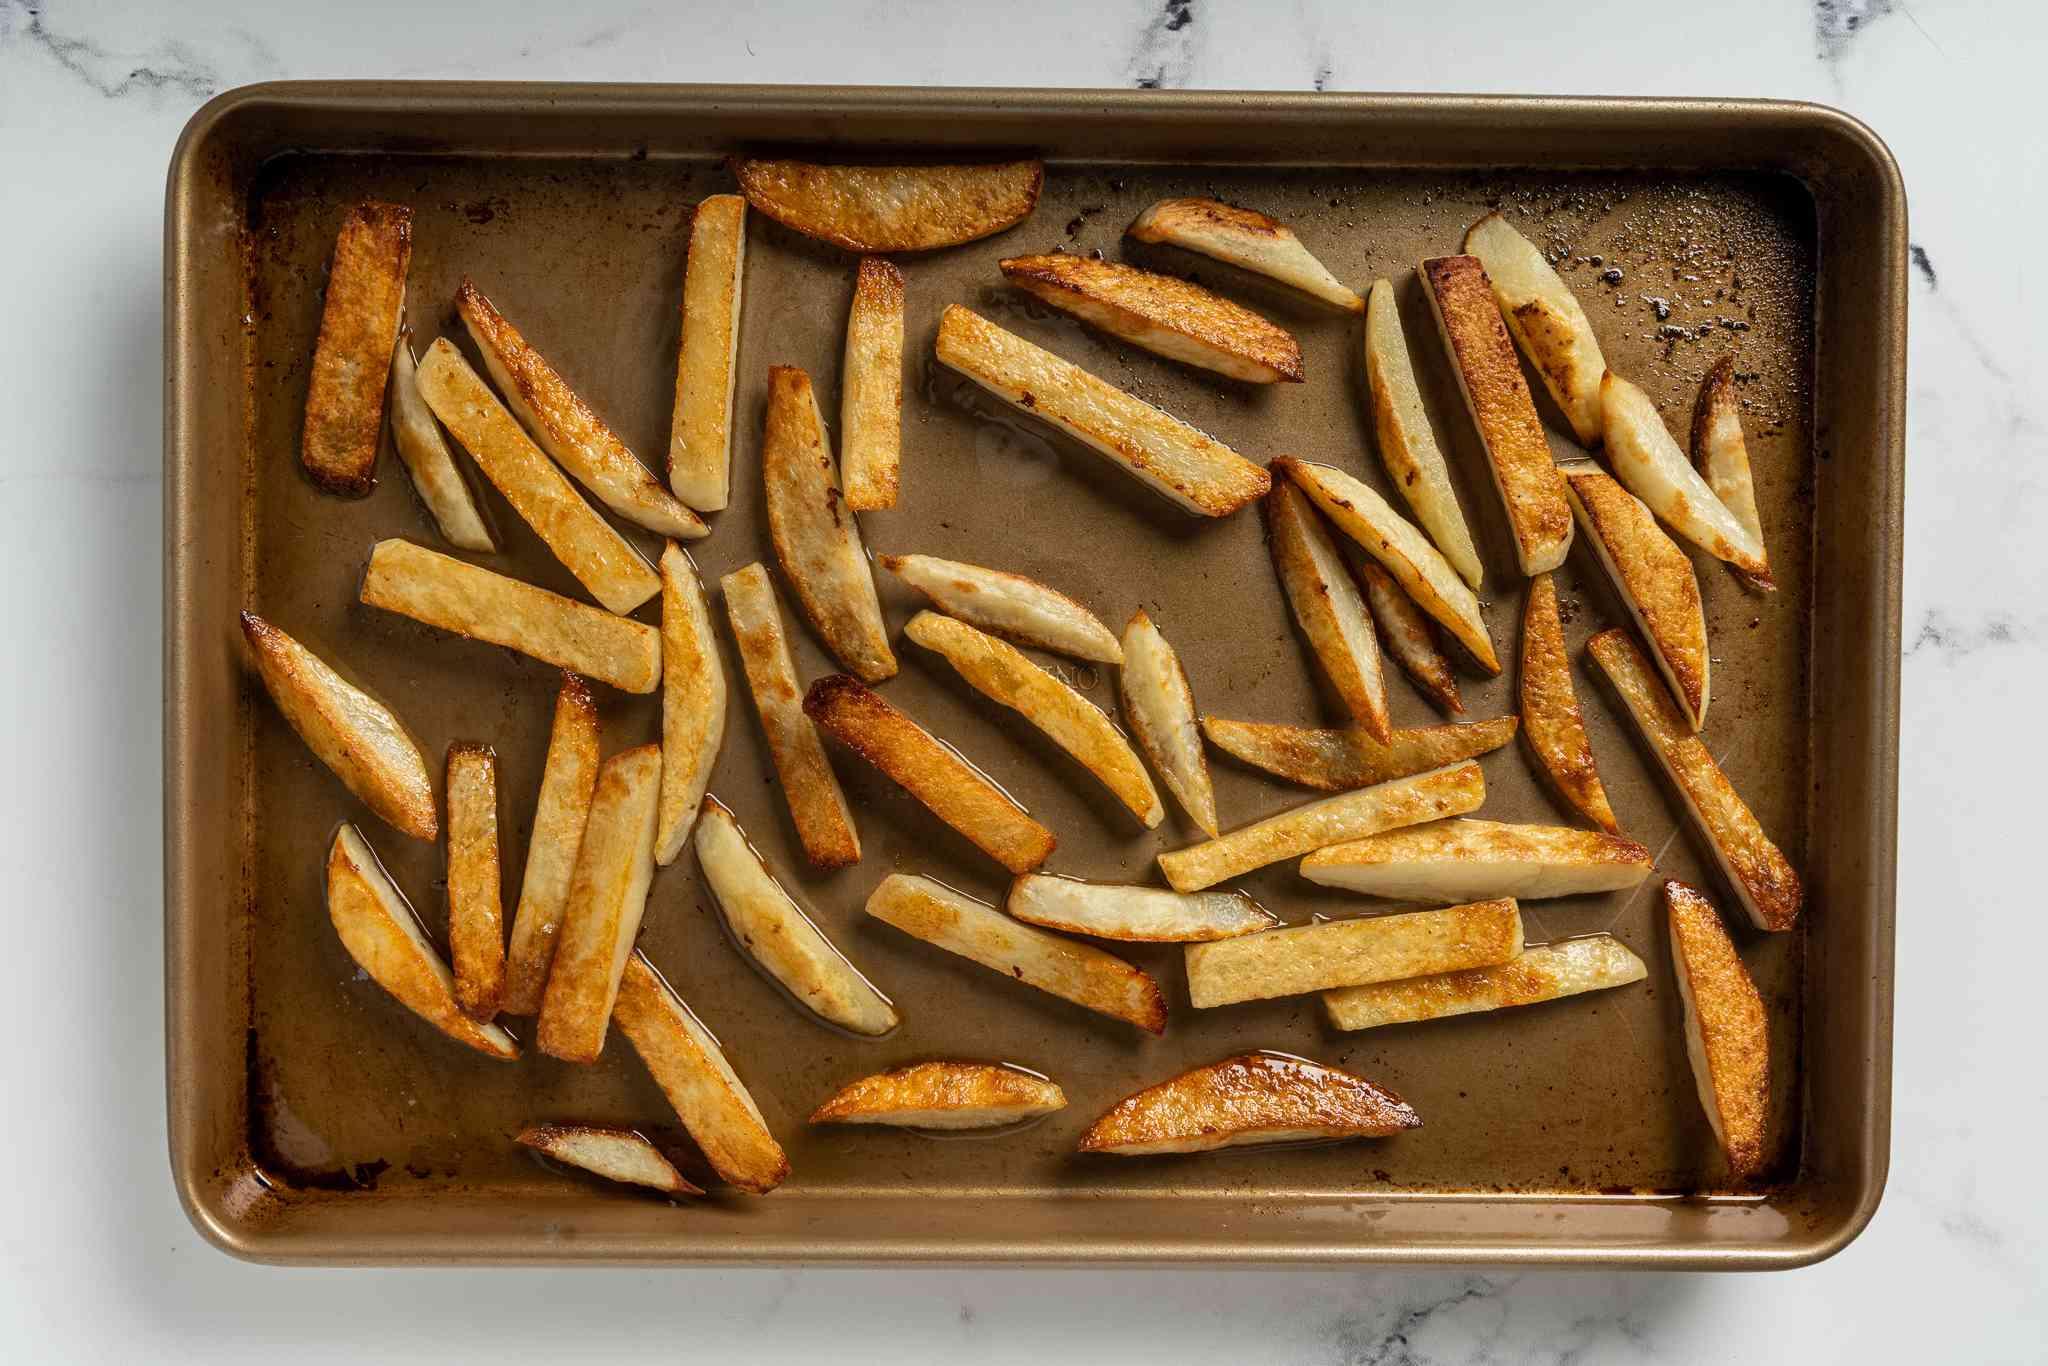 baked potato strips on a baking sheet